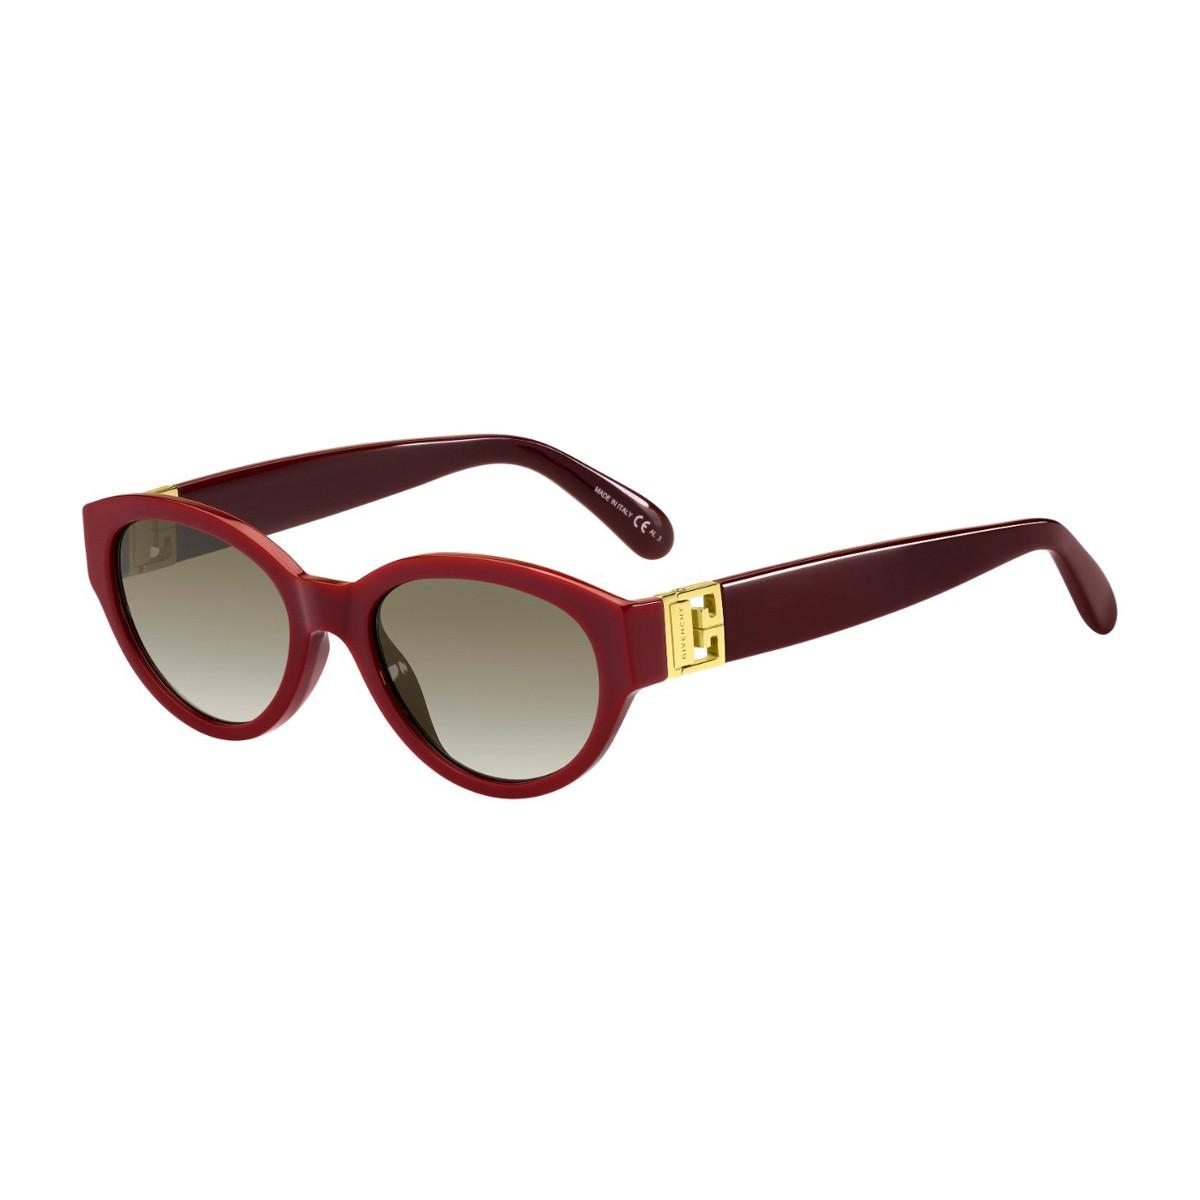 Givenchy GV7143/s   Occhiali da sole Donna